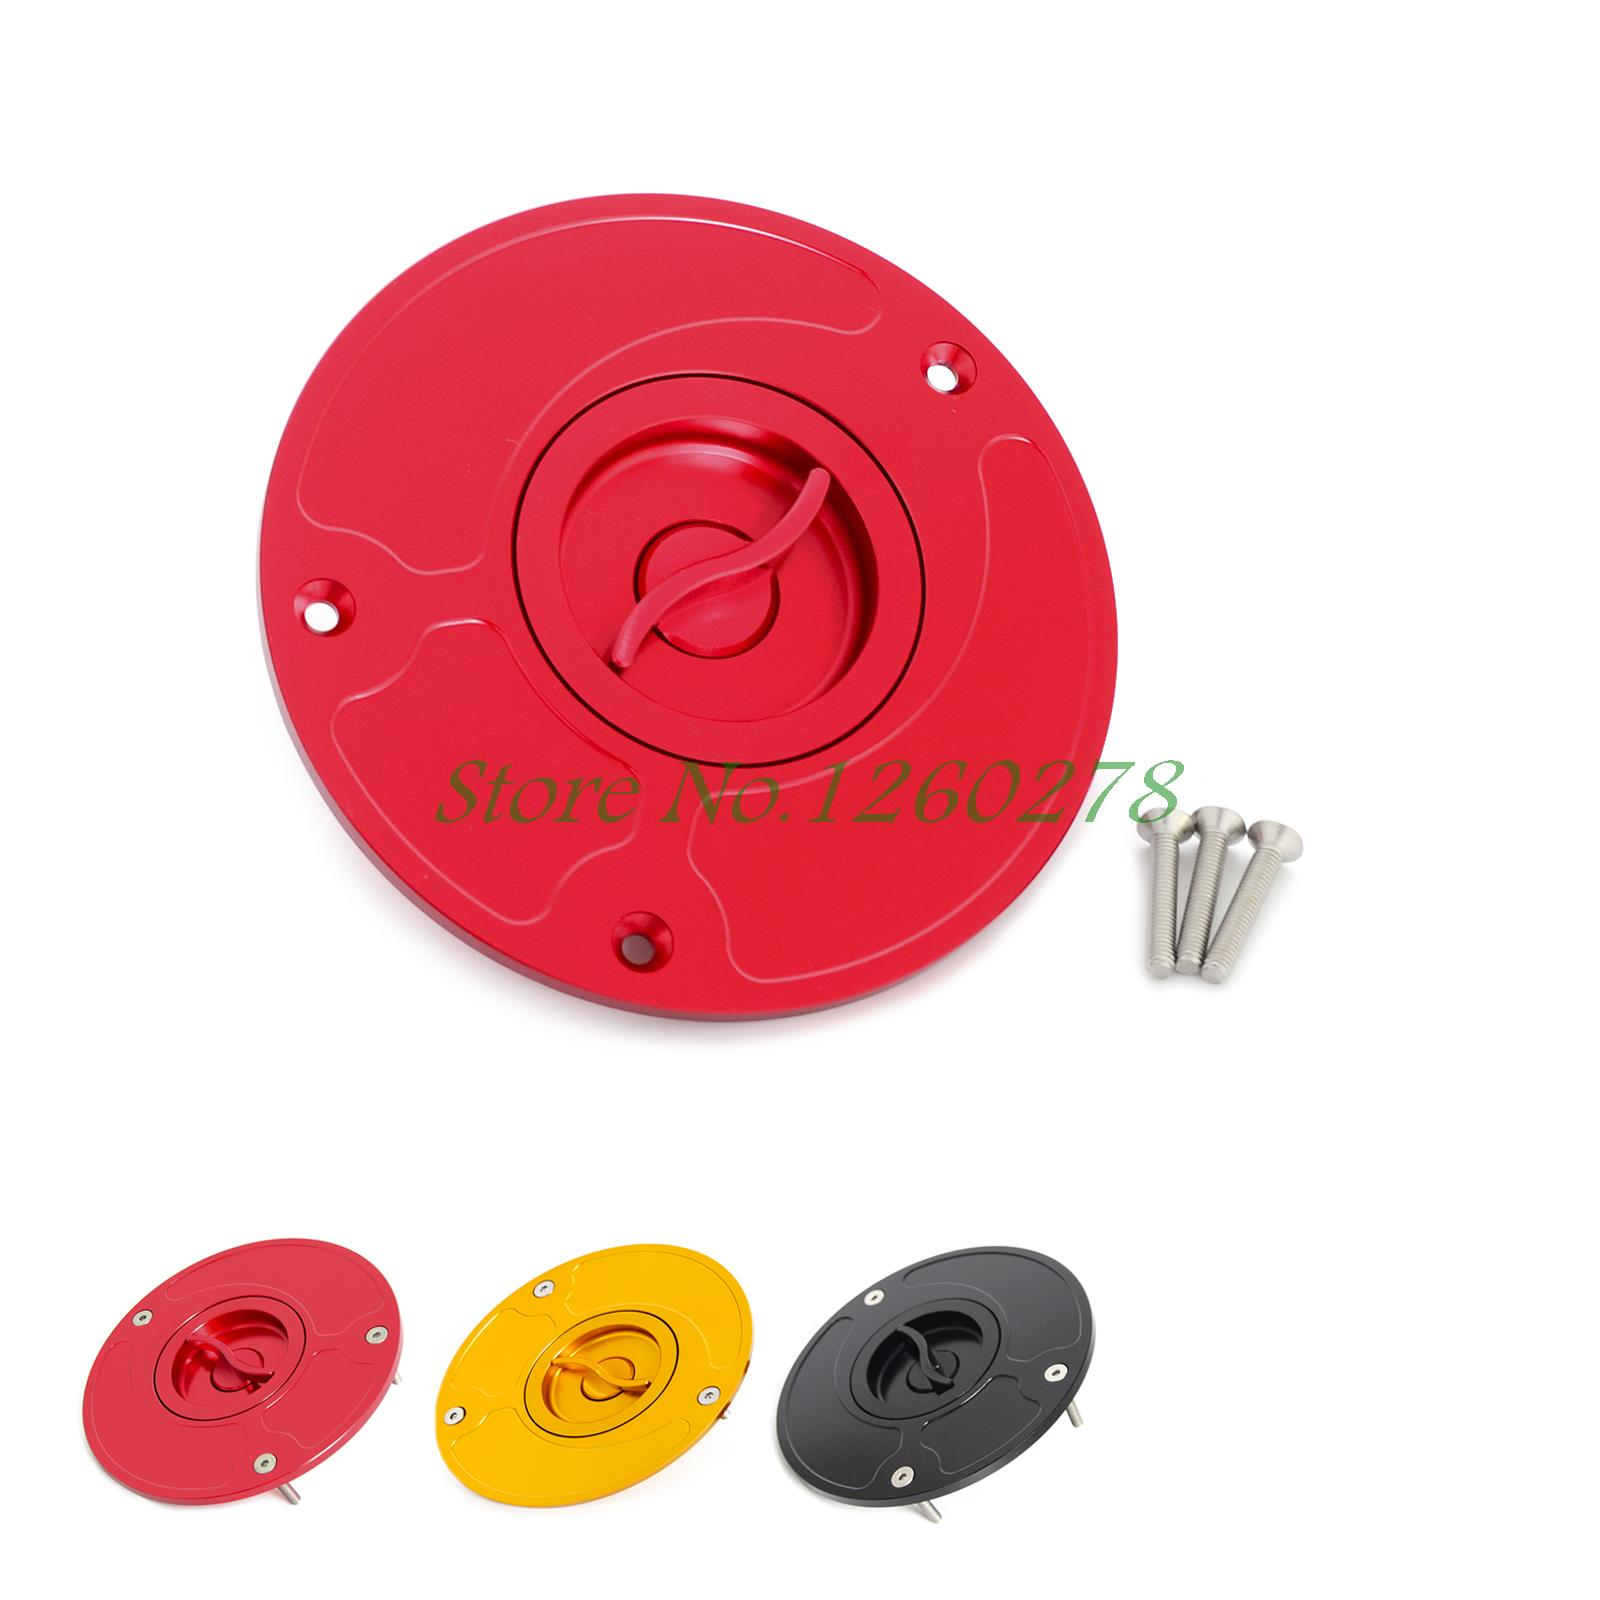 Aluminum Fuel Gas Cap Cover Fit For CBR929 CBR954 CBR 250RR CBR 400RR RVF 400 VFR